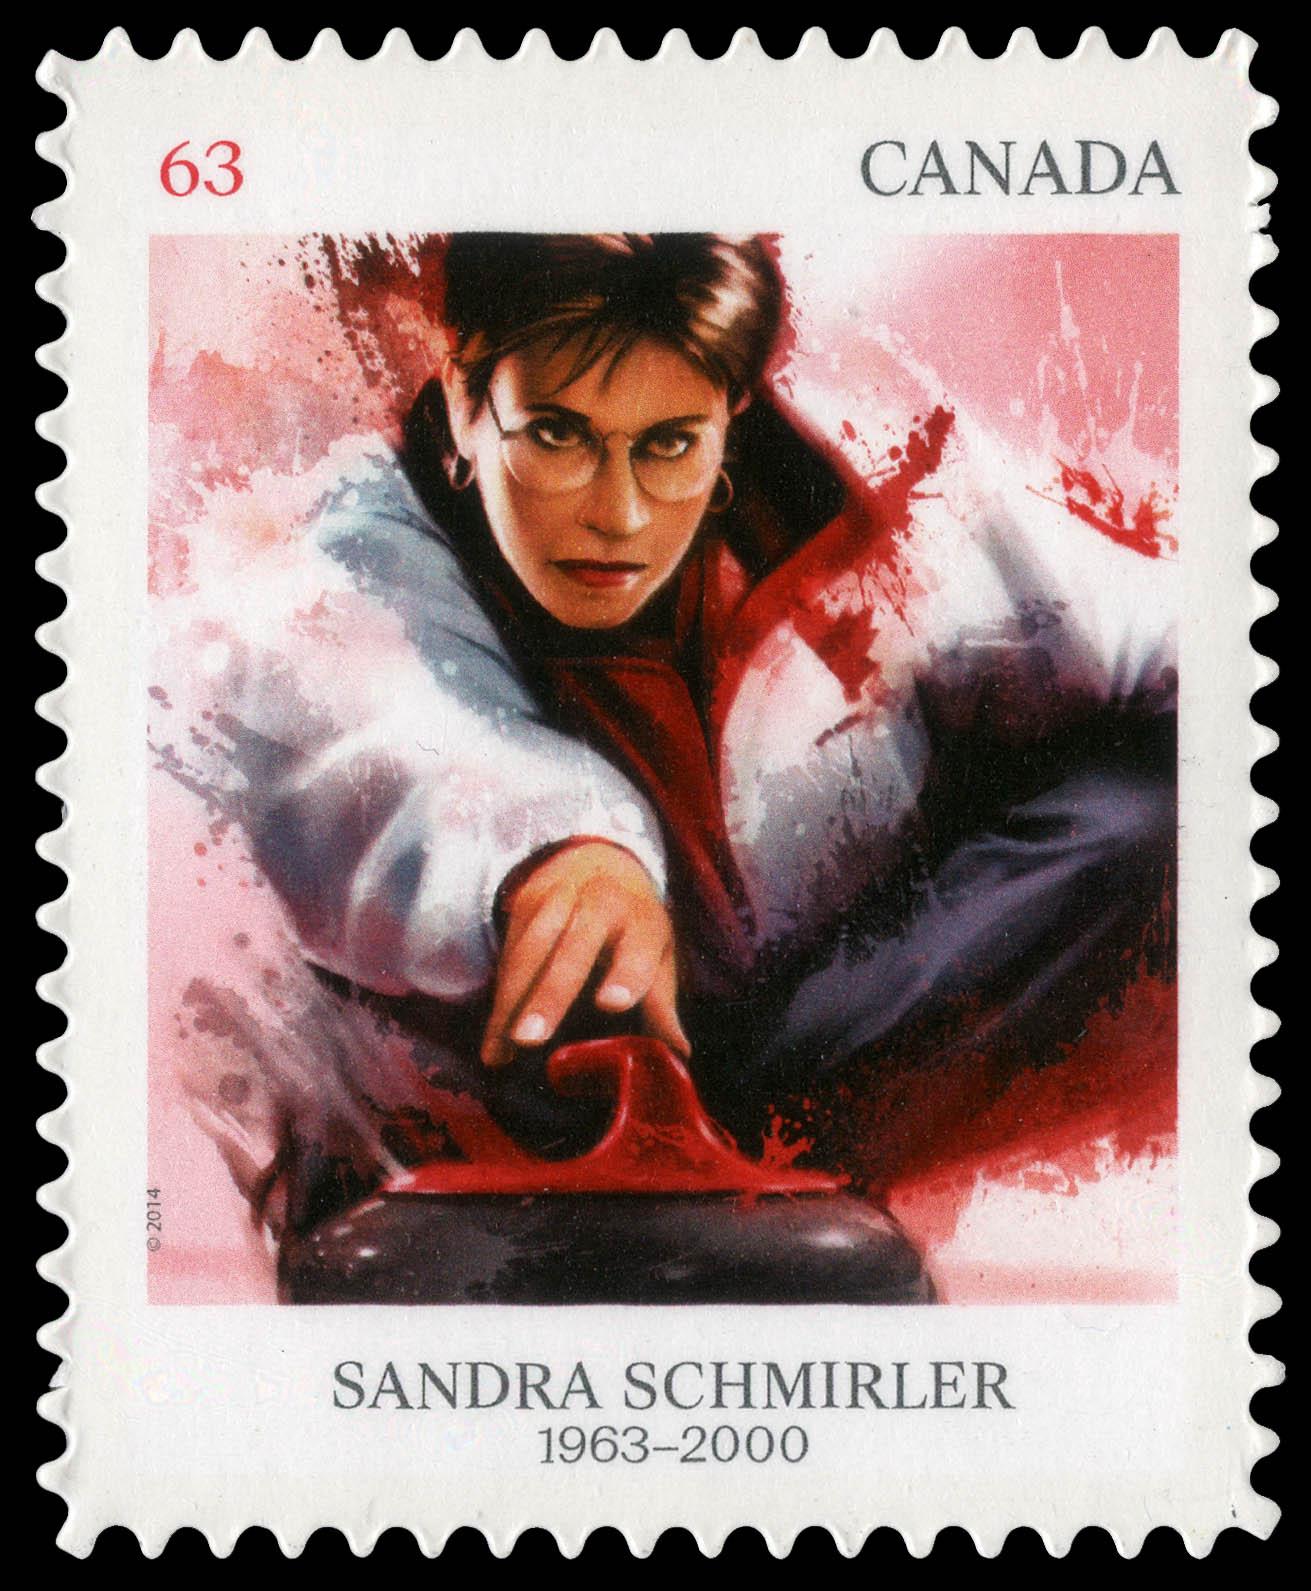 Sandra Schmirler Canada Postage Stamp | Pioneers of Winter Sports